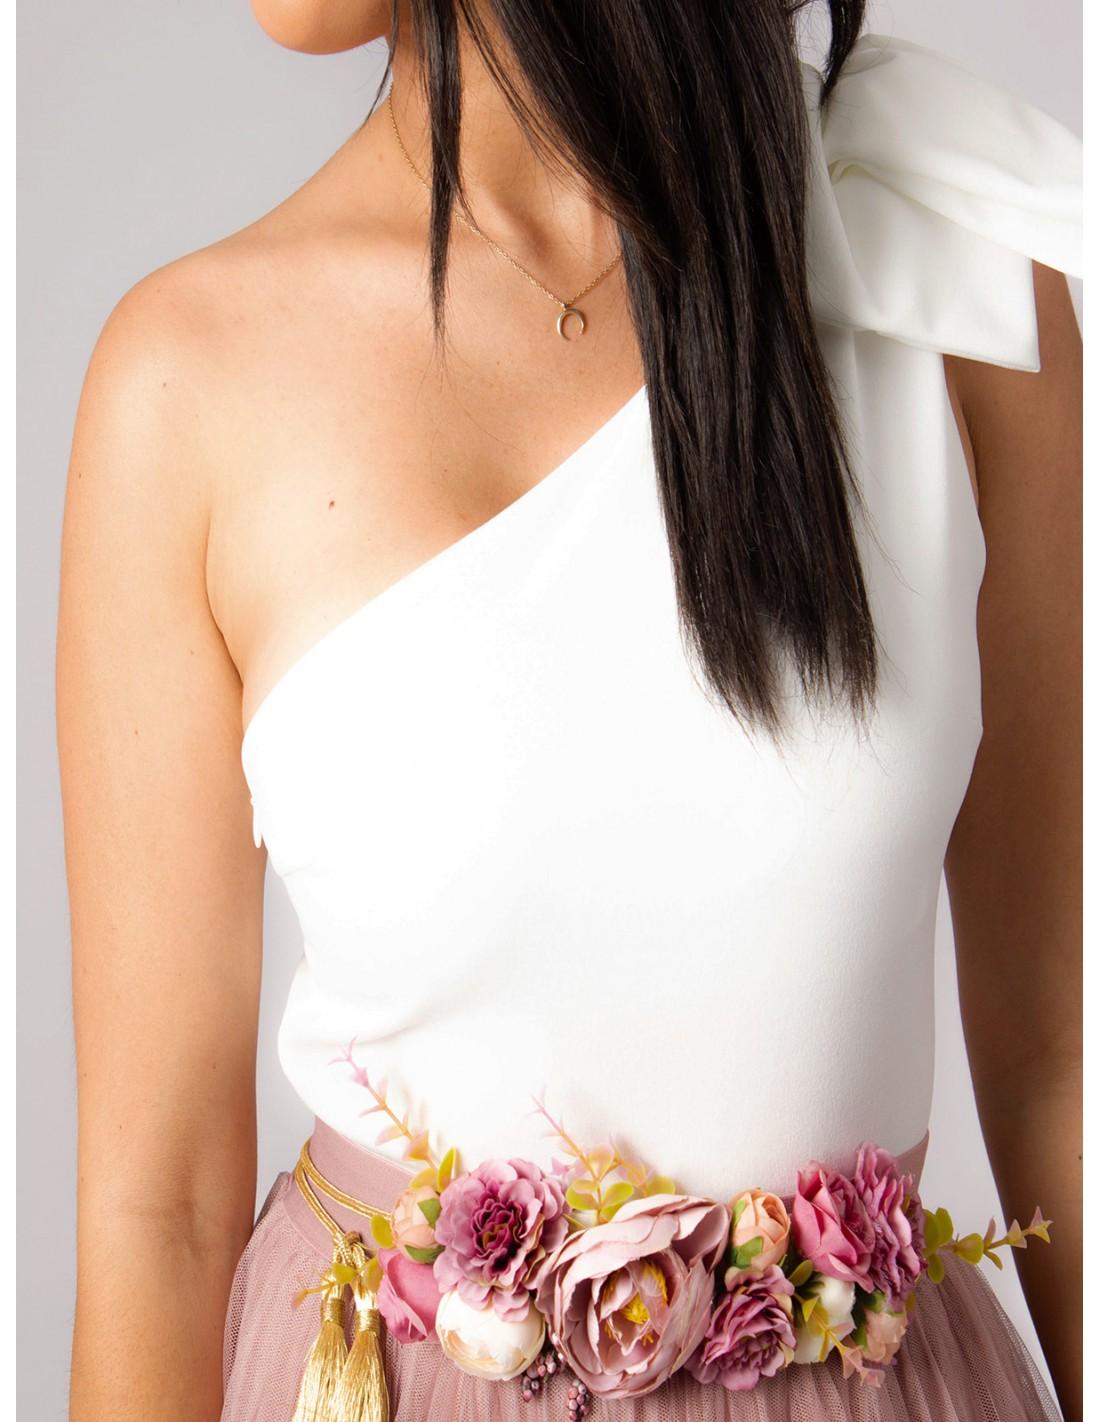 body en color blanco  escote asim u00e9trico  moda fiesta